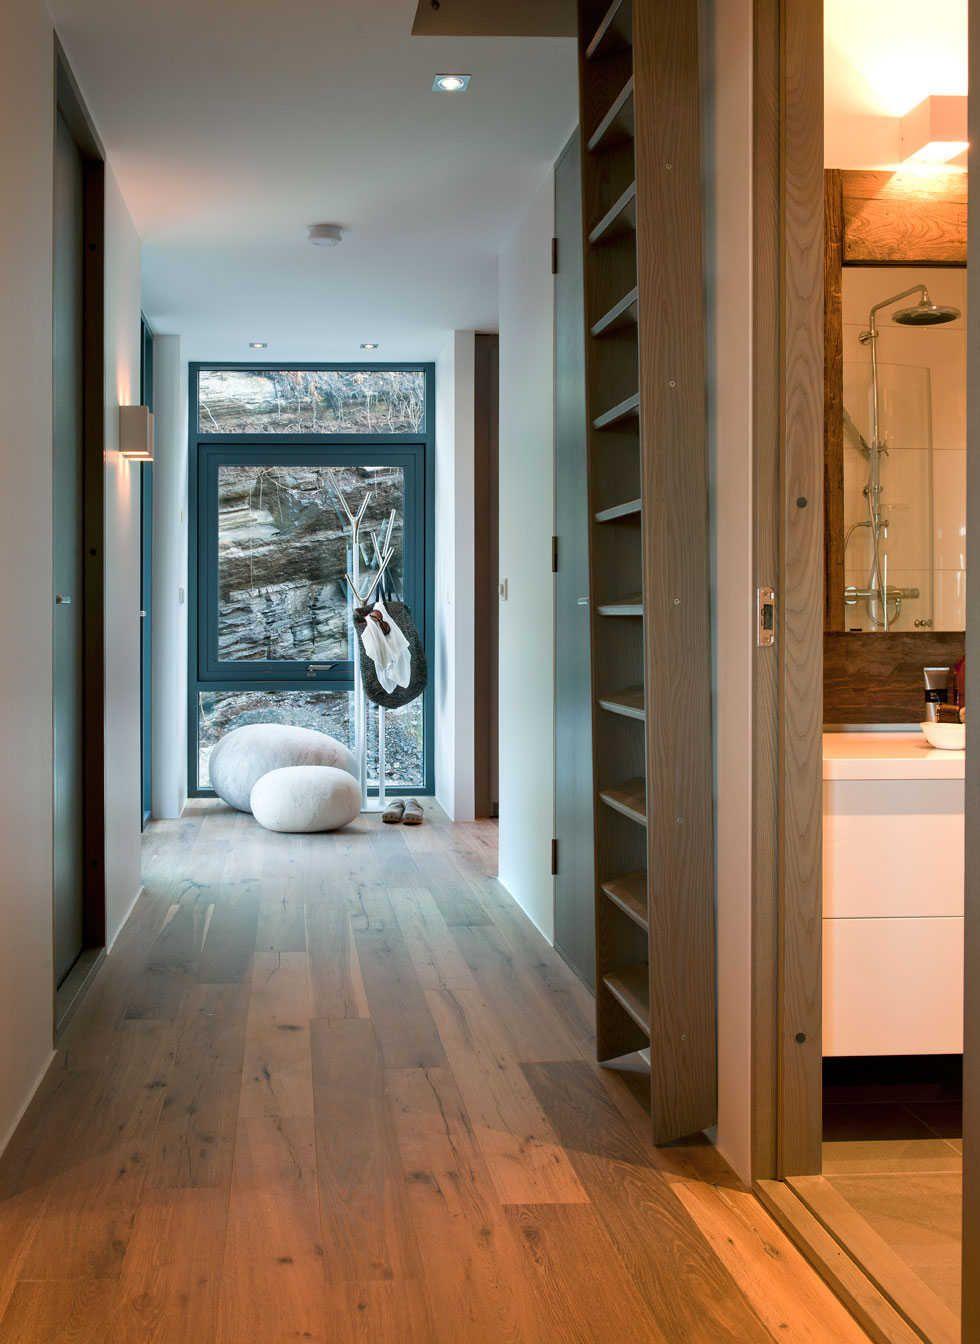 Explore Modern Interior Design, Interior Ideas, And More!